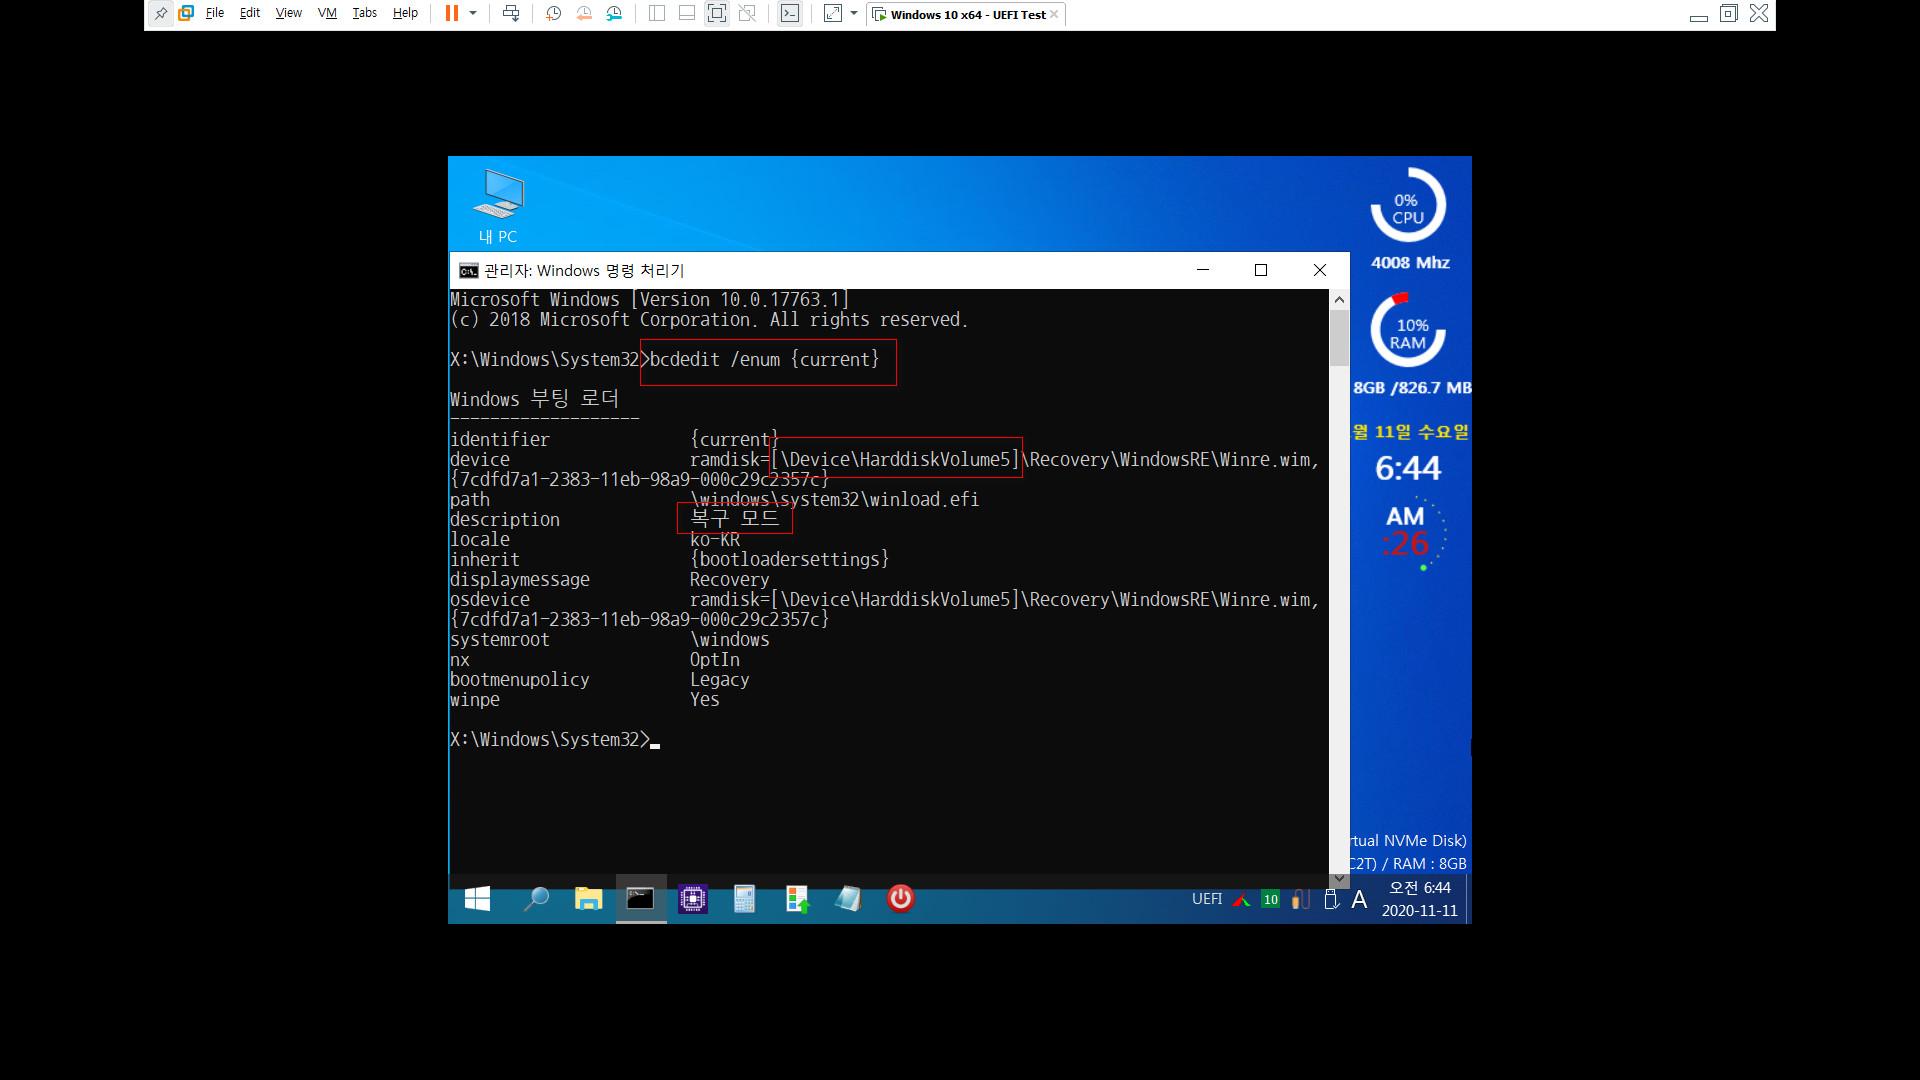 Winre.wim [복구 모드] 재구성하기 3 - 복구파티션 포함 [2020-11-11].bat 테스트 2020-11-11_064427.jpg